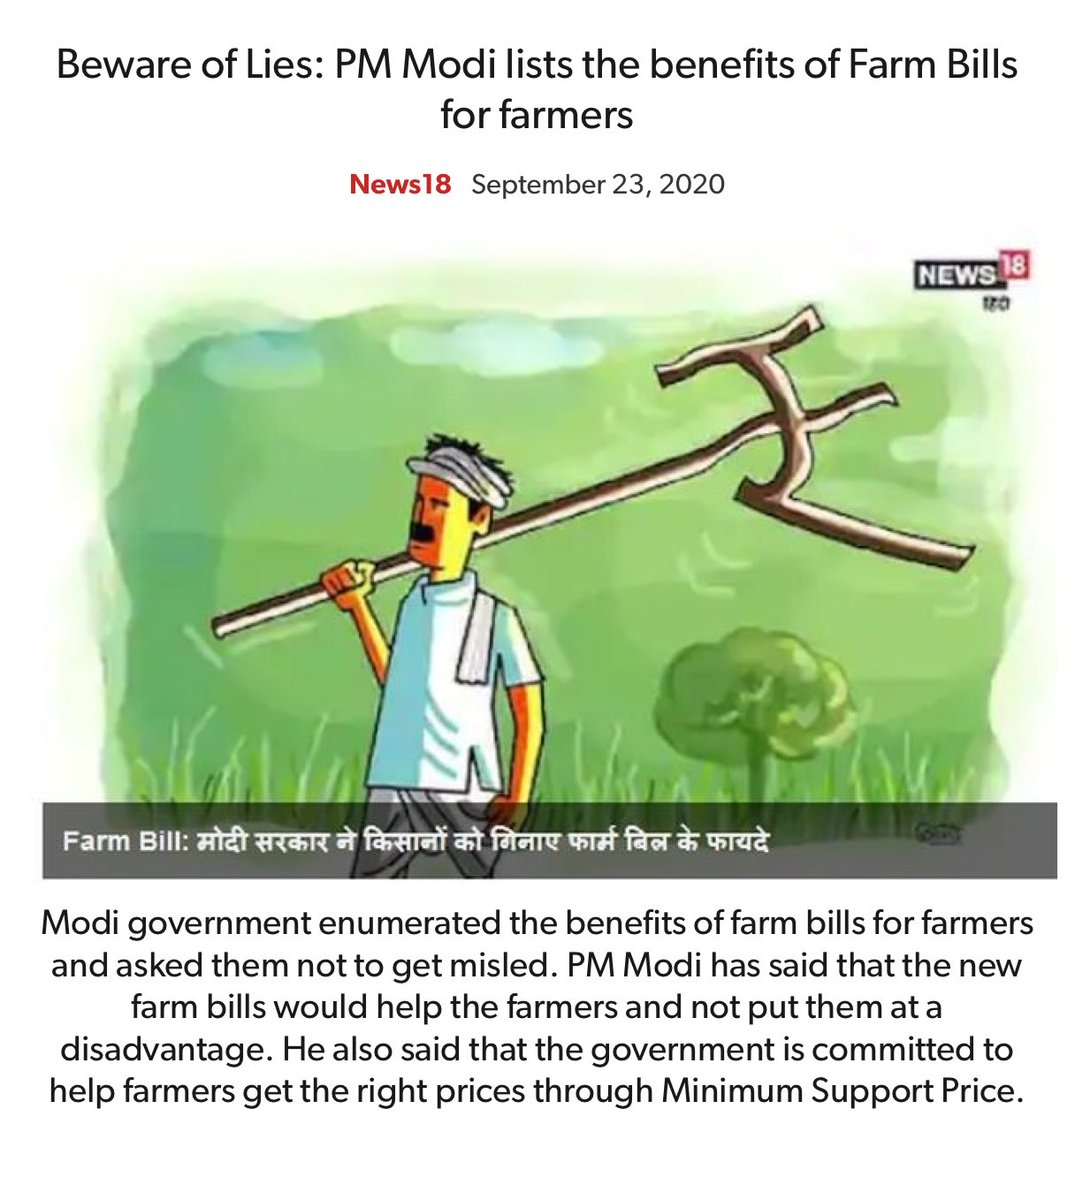 Beware of Lies: PM Modi lists the benefits of Farm Bills for farmers https://t.co/uFKEDx0iVG  via NaMo App https://t.co/5cFJa8fvCk